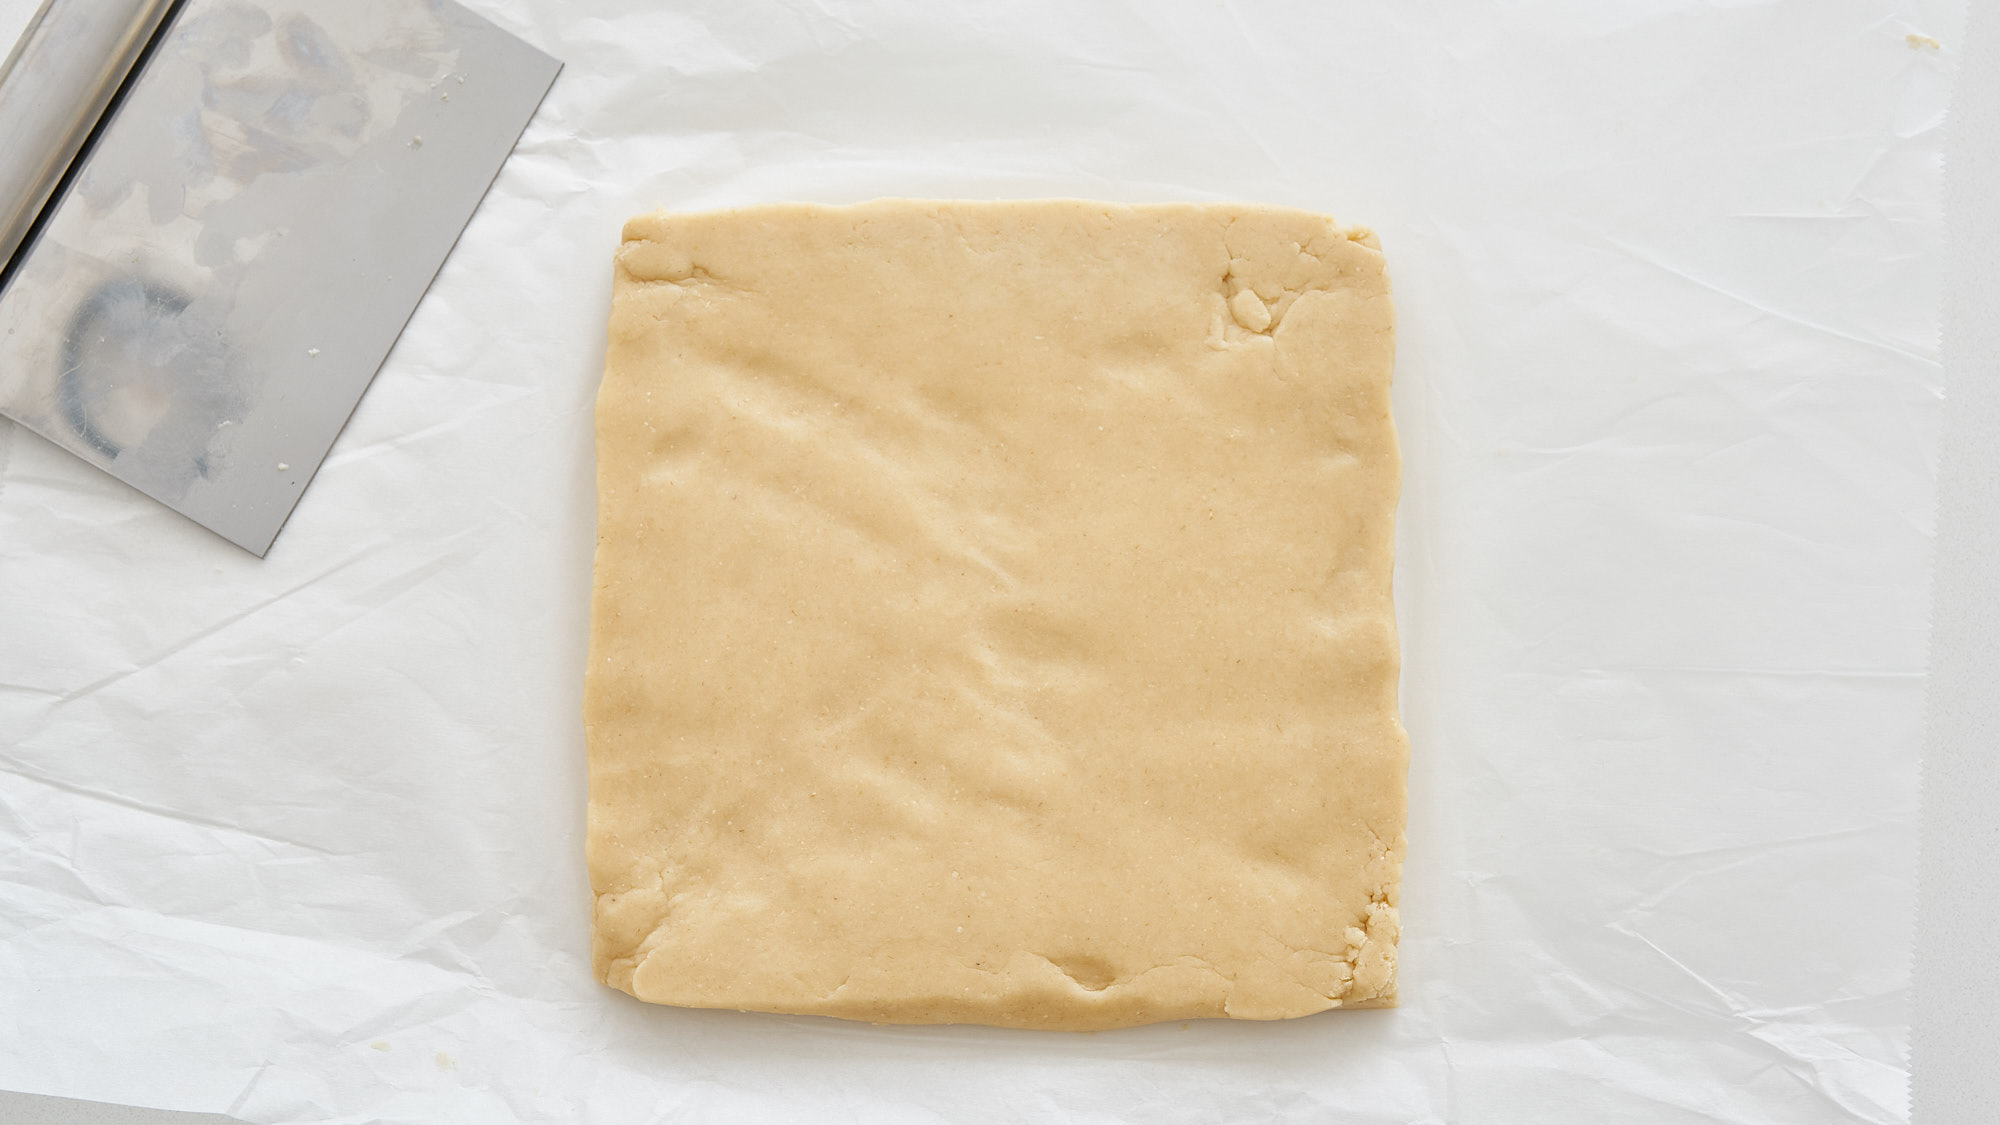 A square of shortbread cookie dough